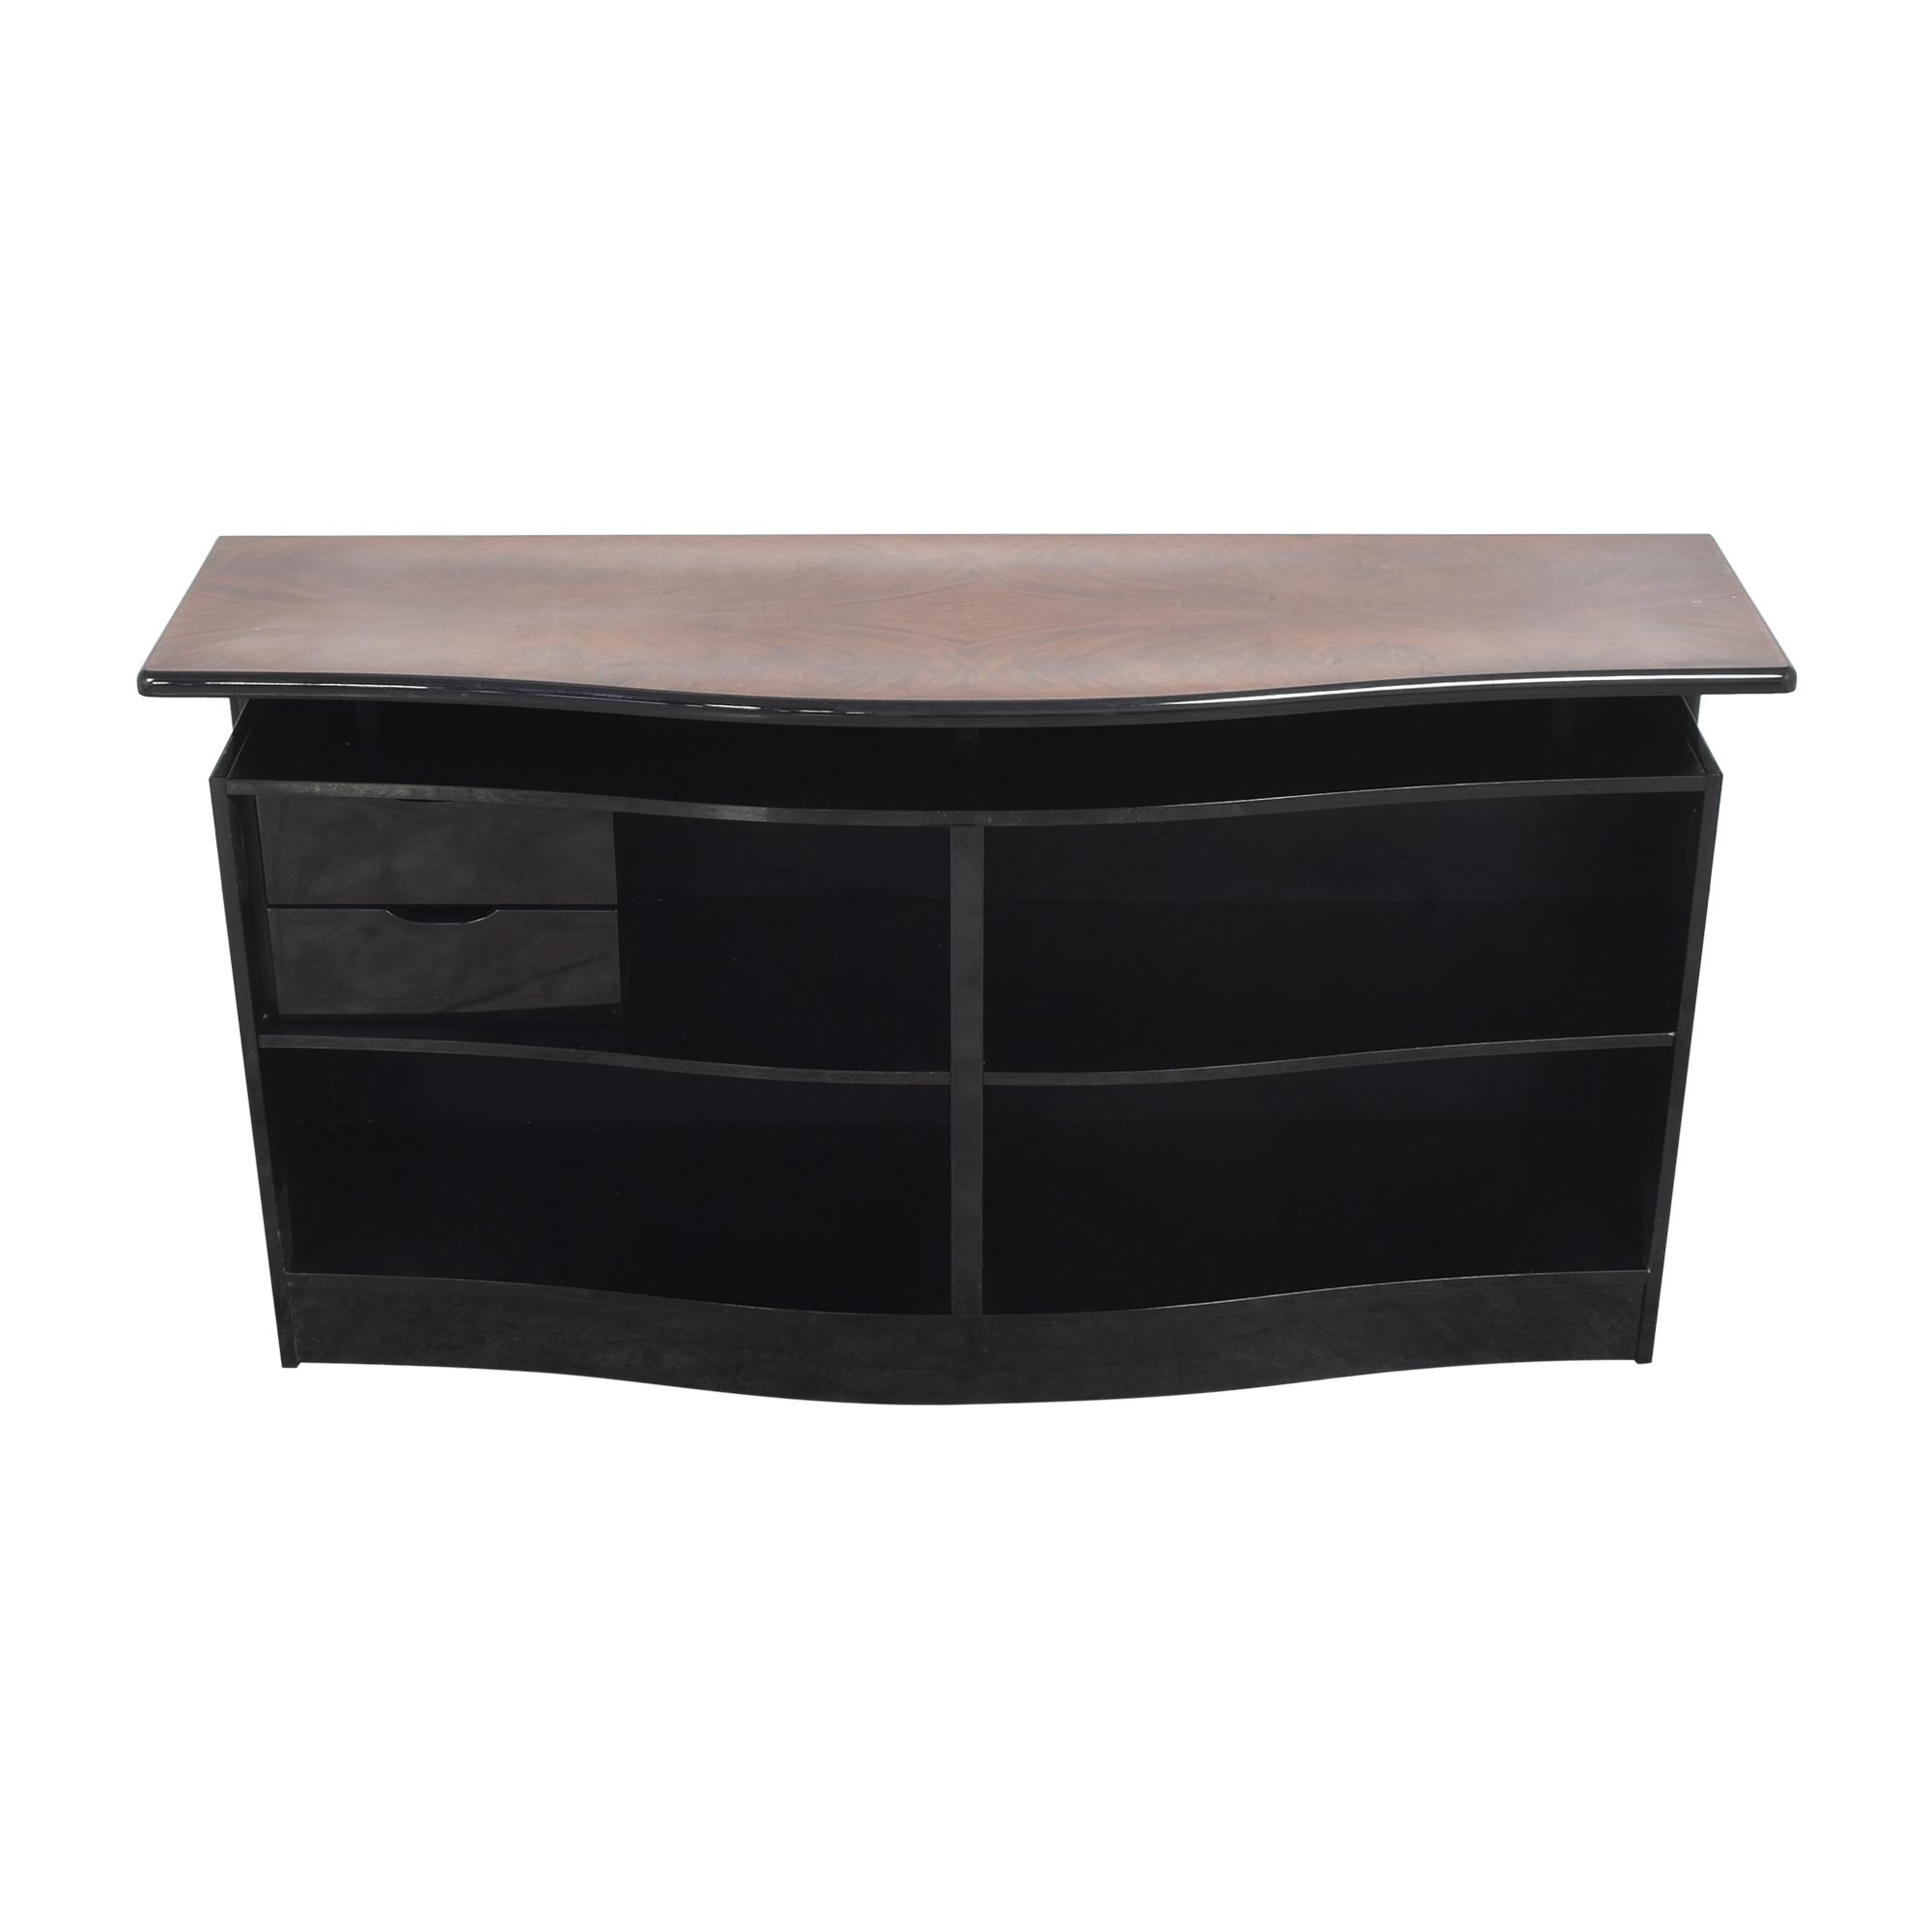 Excelsior Designs Excelsior Designs Cubby Sideboard Cabinets & Sideboards